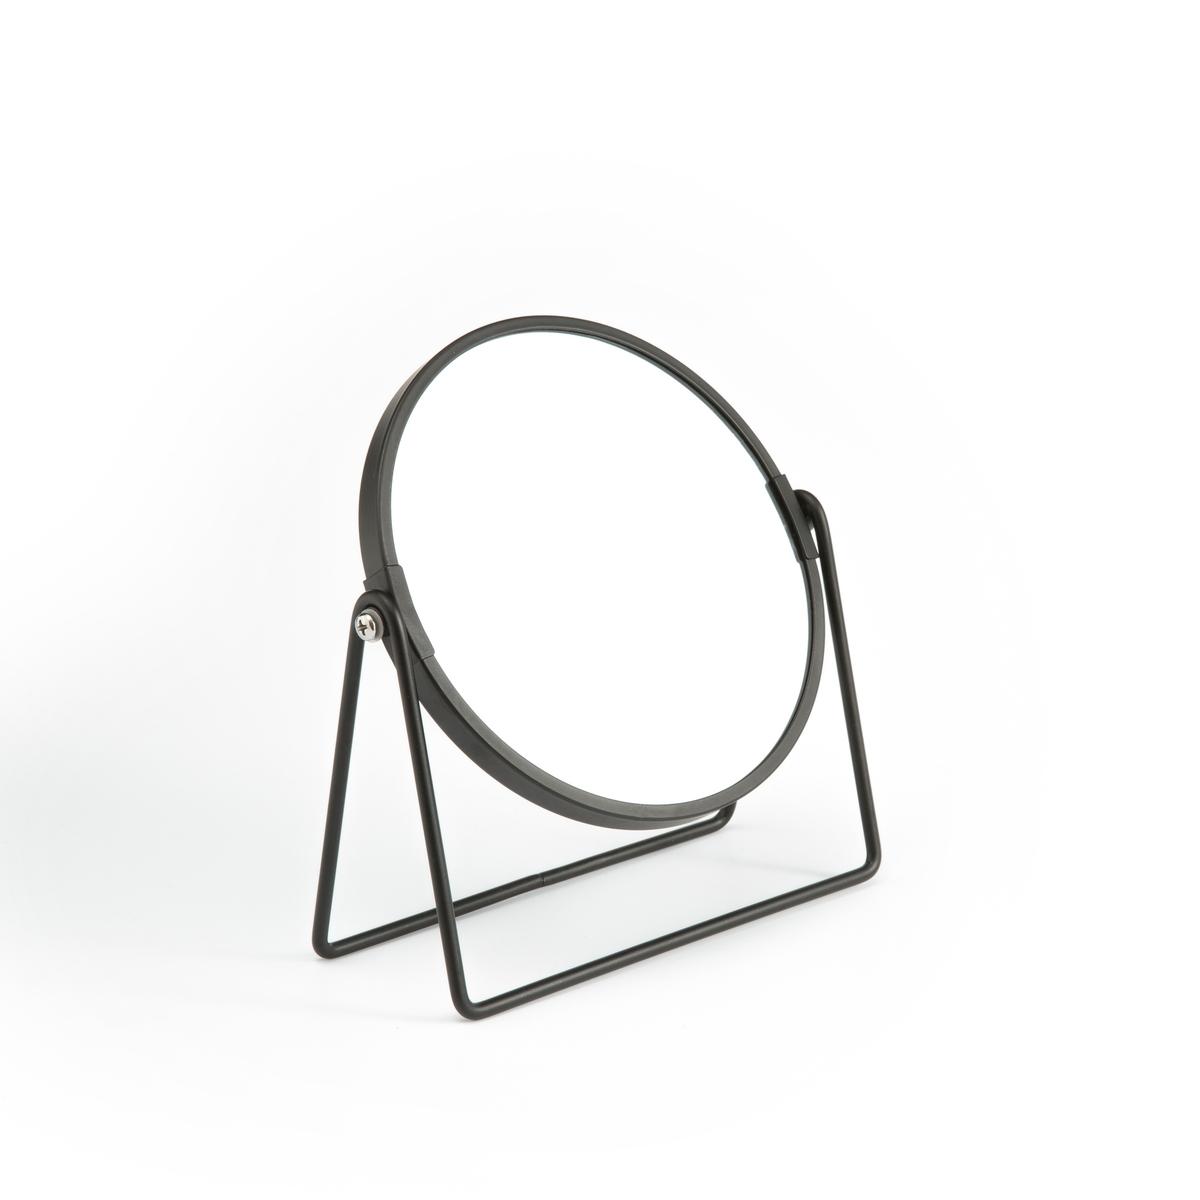 Зеркало круглое для ванной FIOLANA зеркало круглое ø60 см